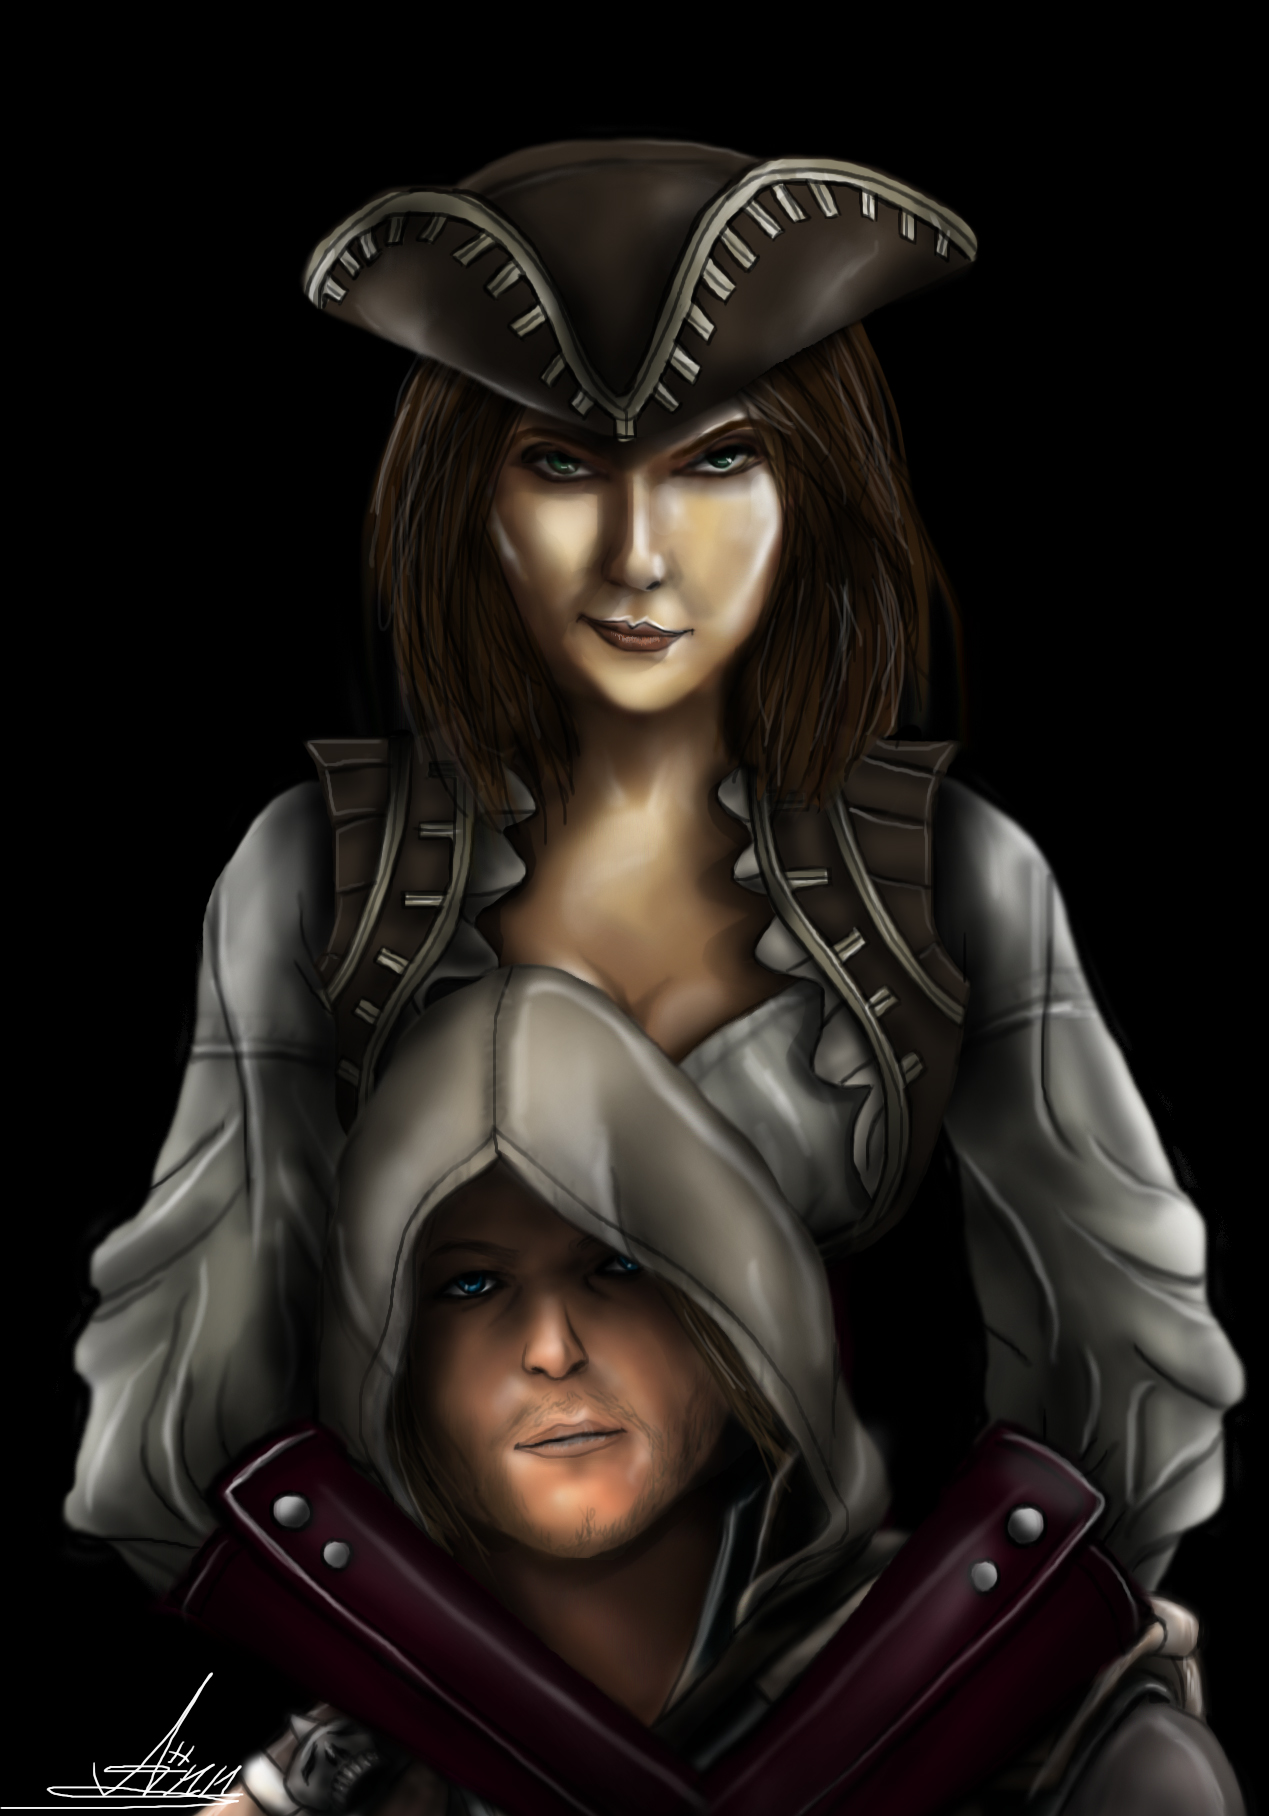 Anne Bonny Assassins Creed Black Flag By Ladylionheart On